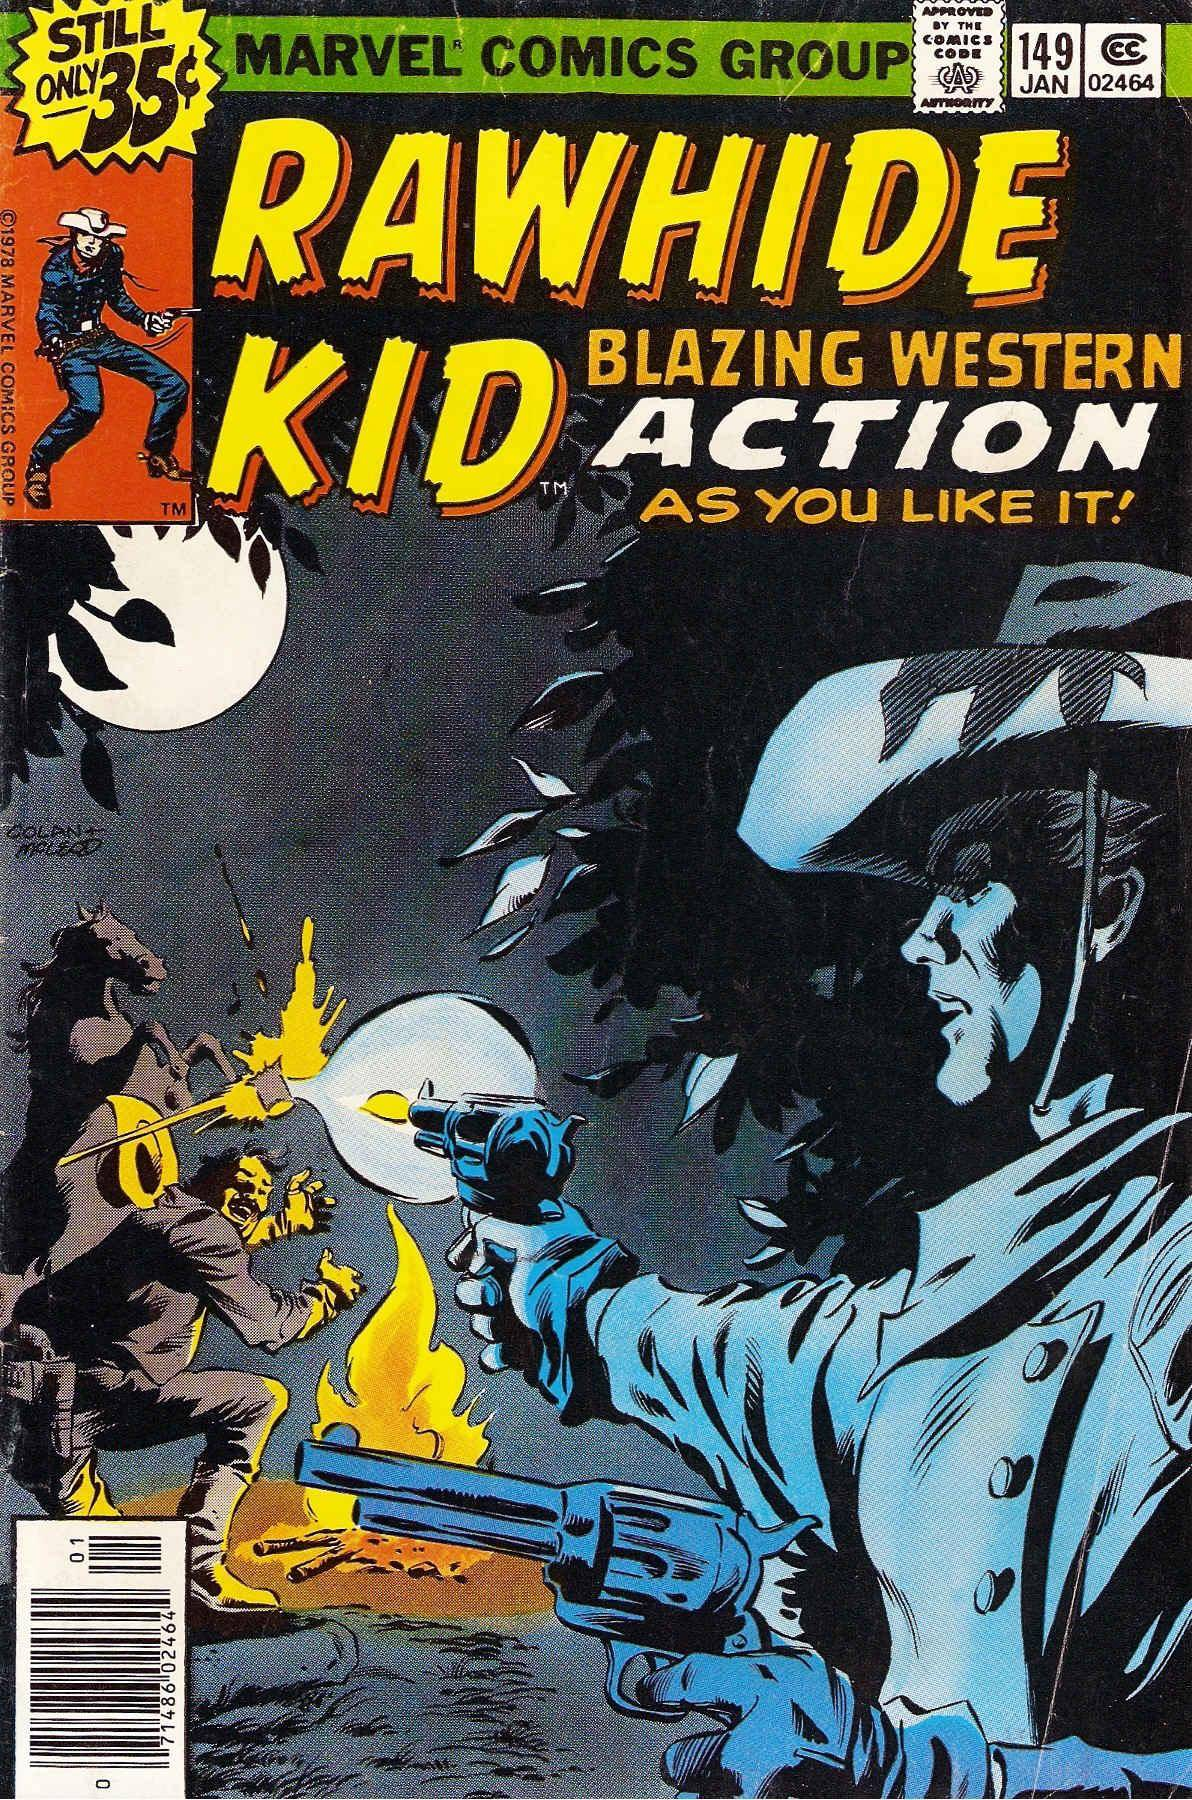 Rawhide Kid v1 149 1979 bluejeff1954